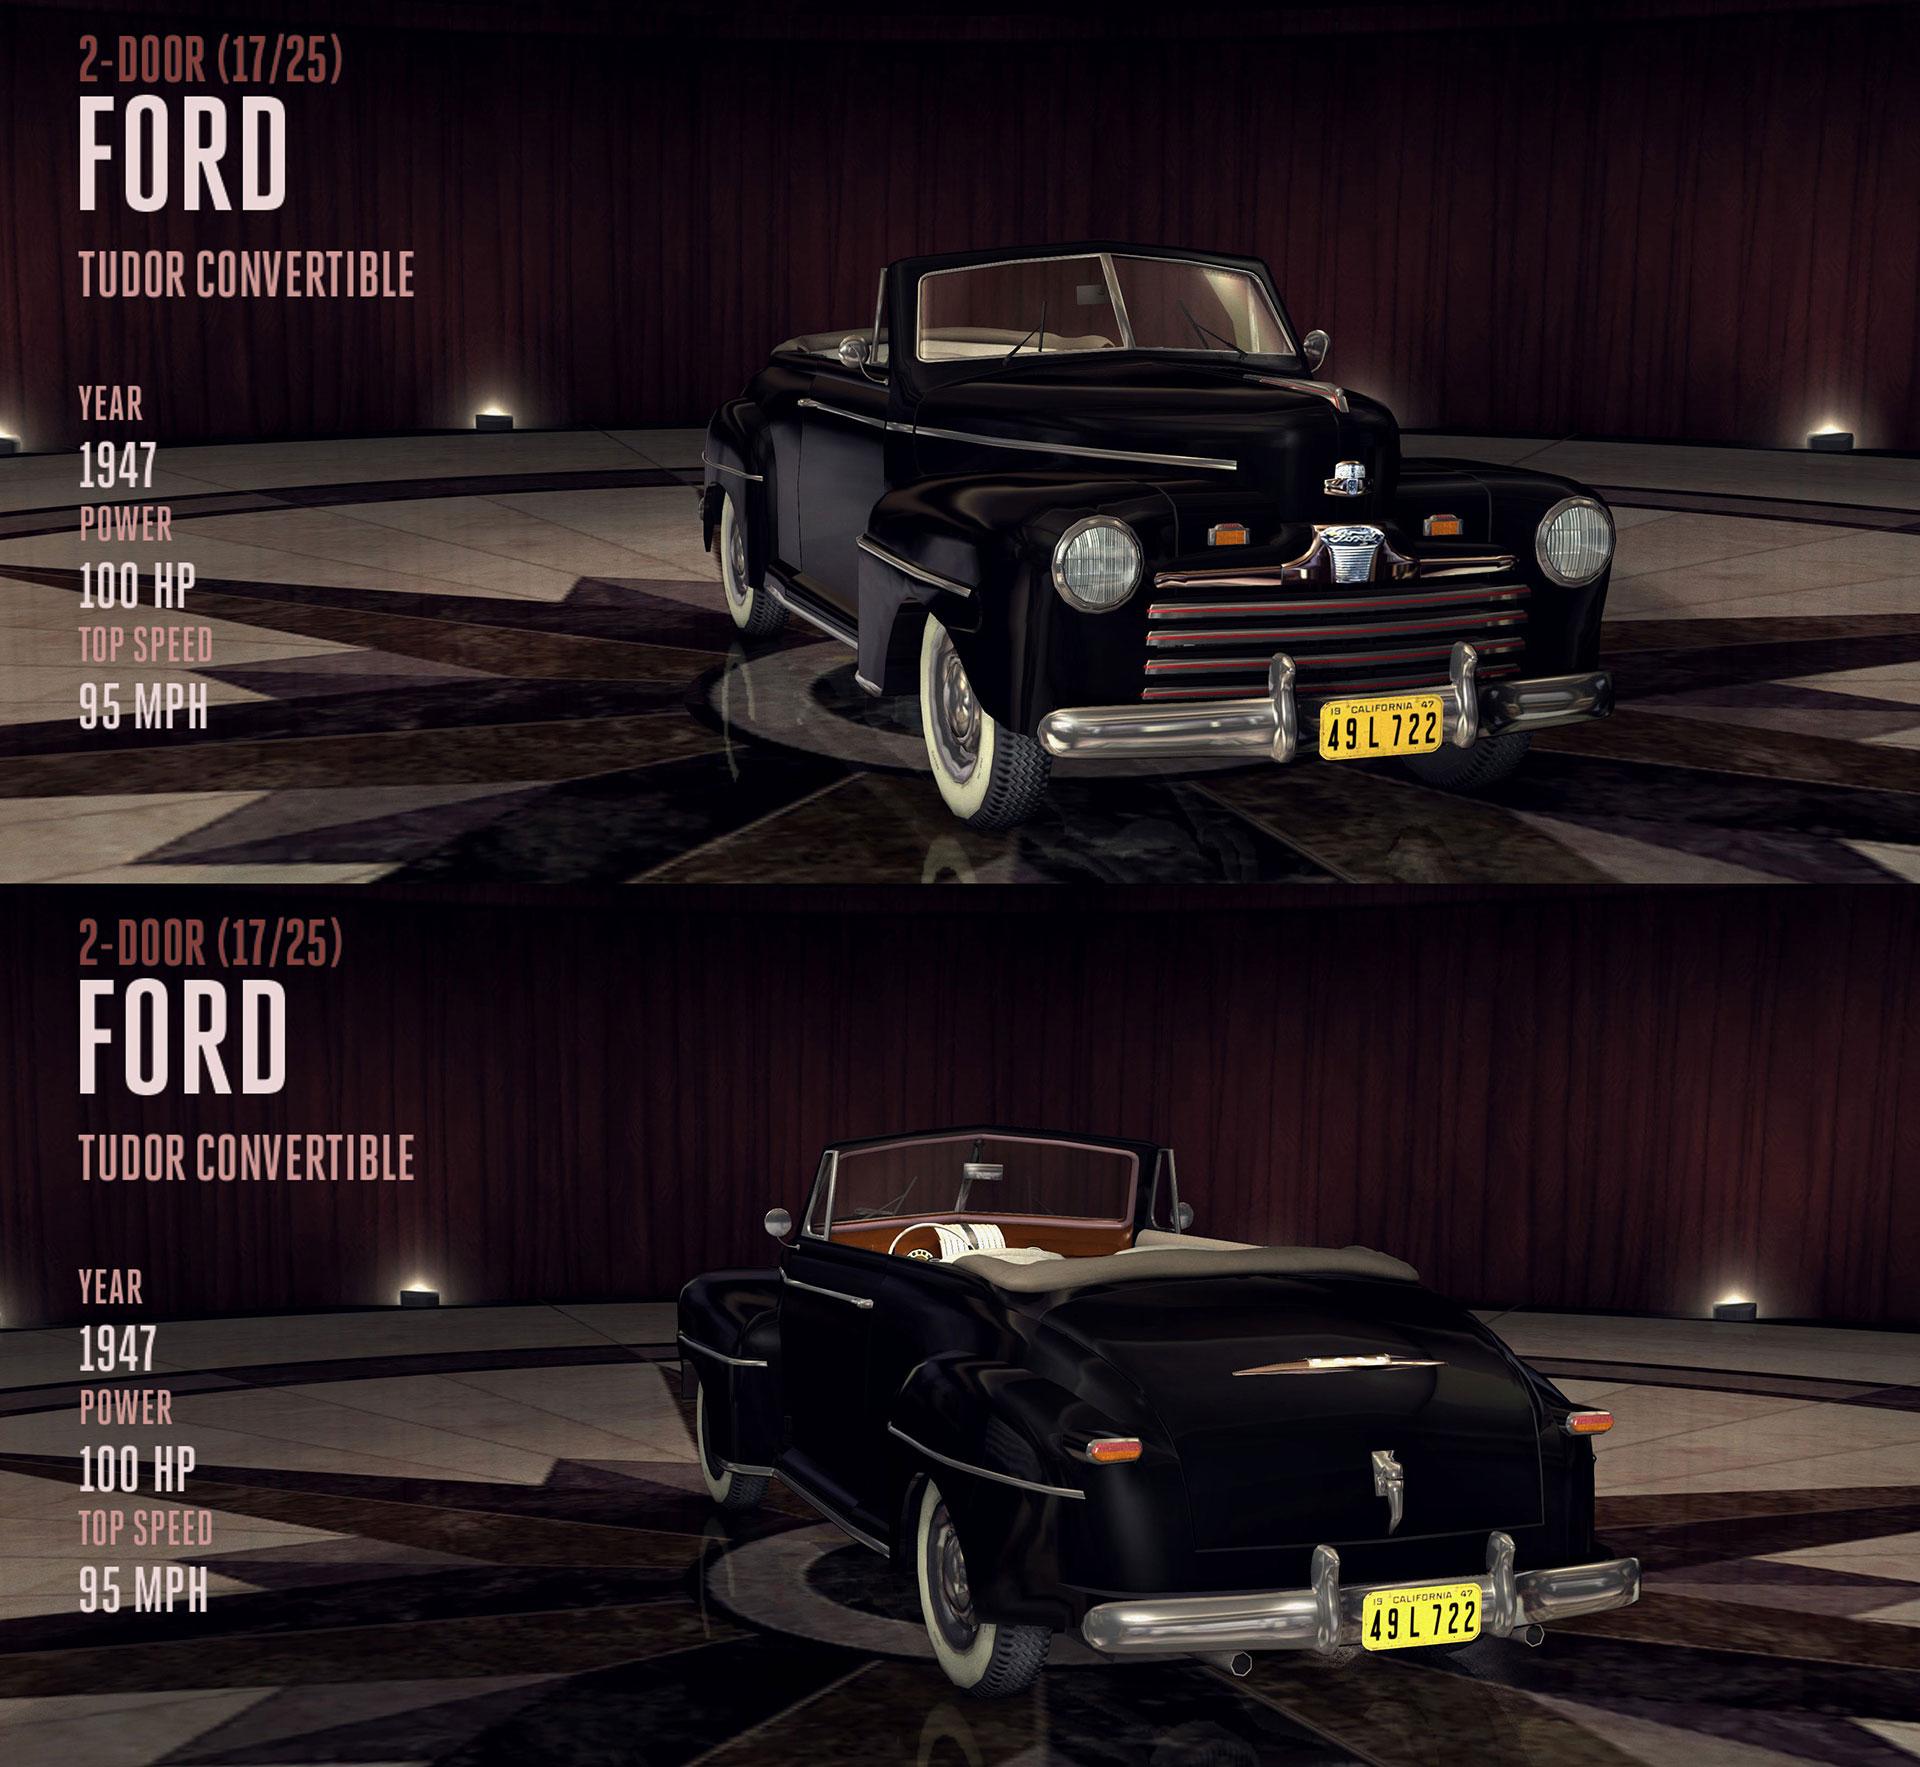 Ford Tudor Convertible